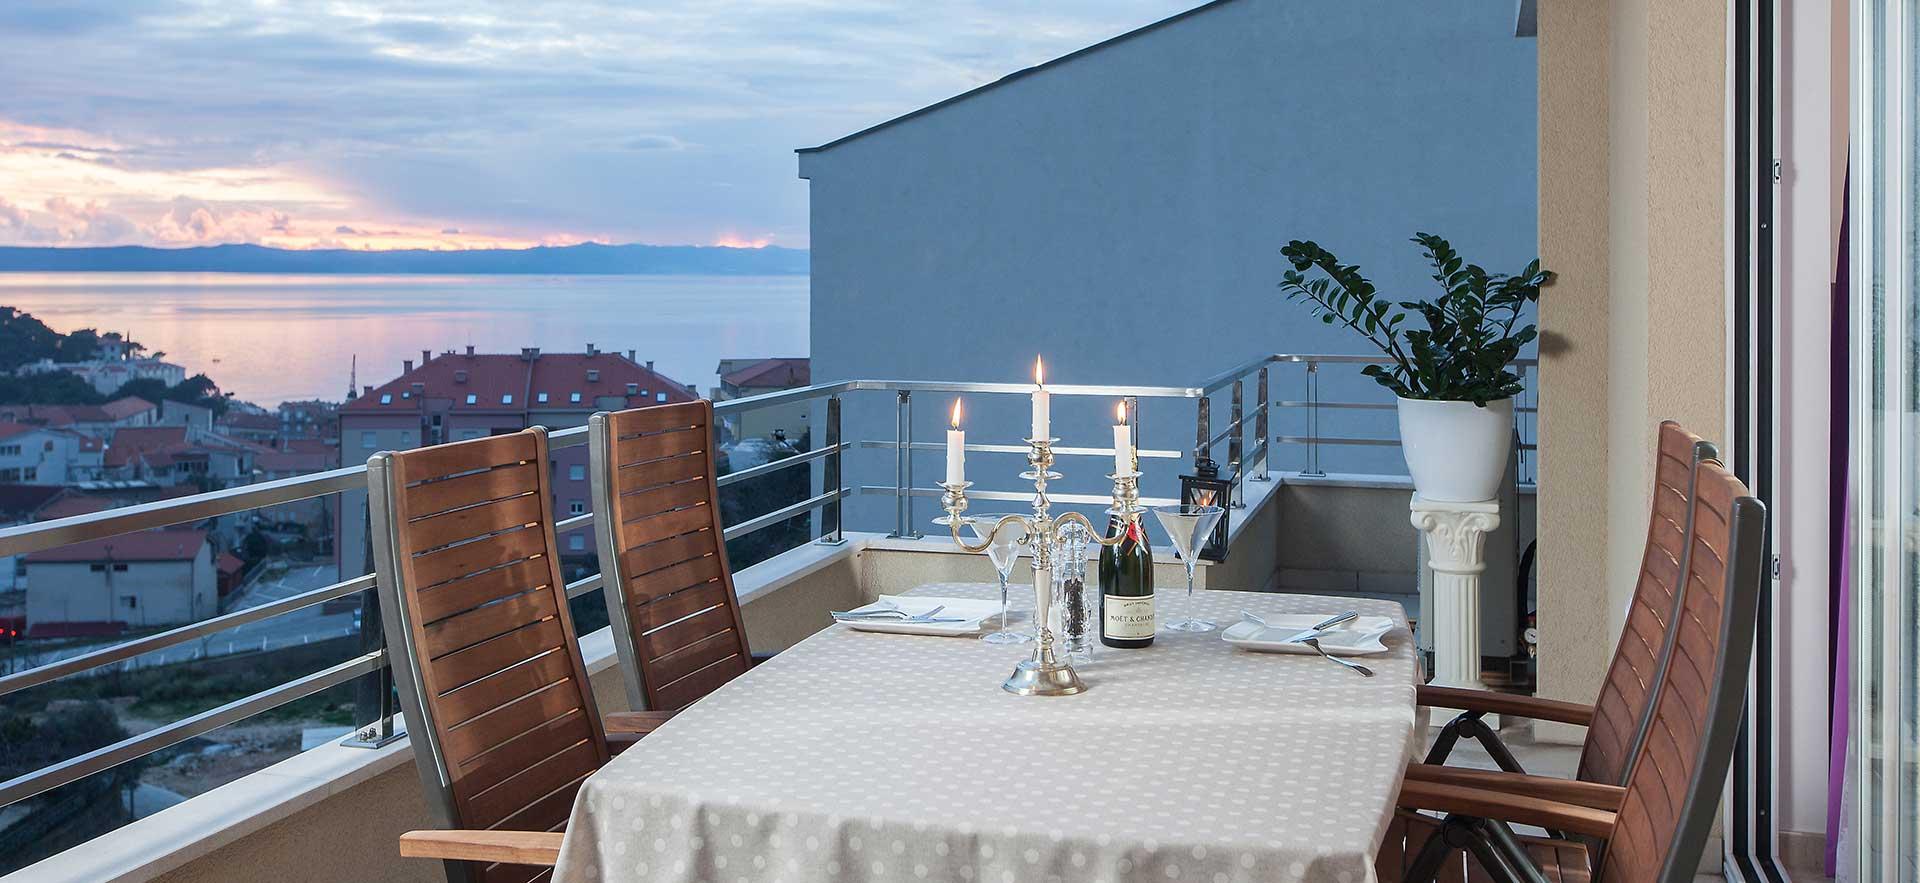 Makarska Croatia Luxury Apartments For Apartment Mario